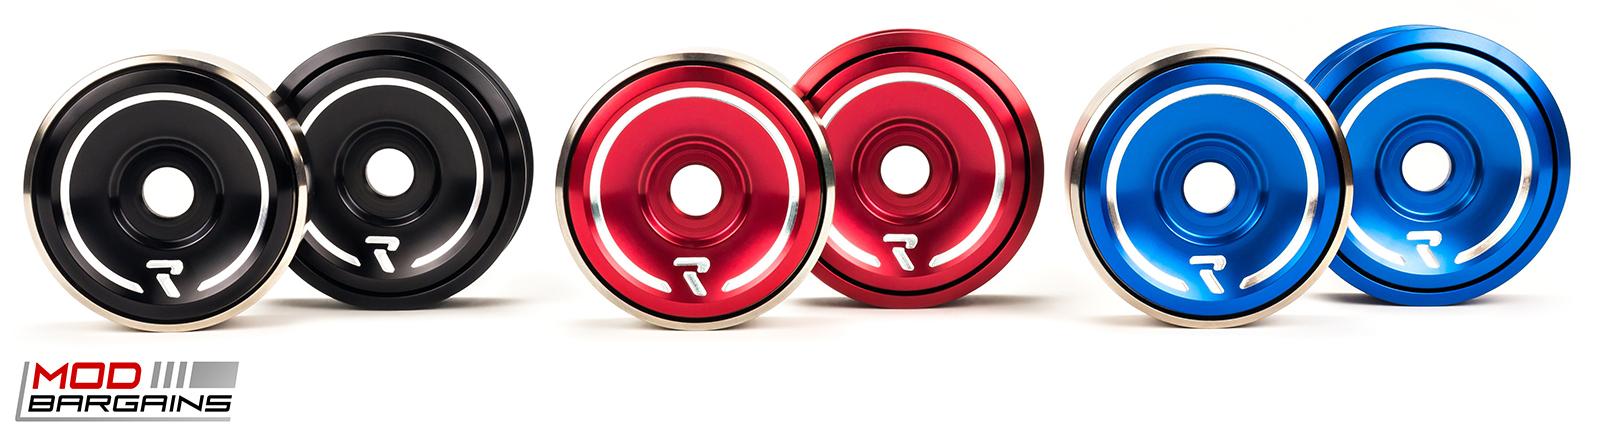 Raceseng Revo Tensioners Colors for 2013+ Scion FRS/Subaru BRZ